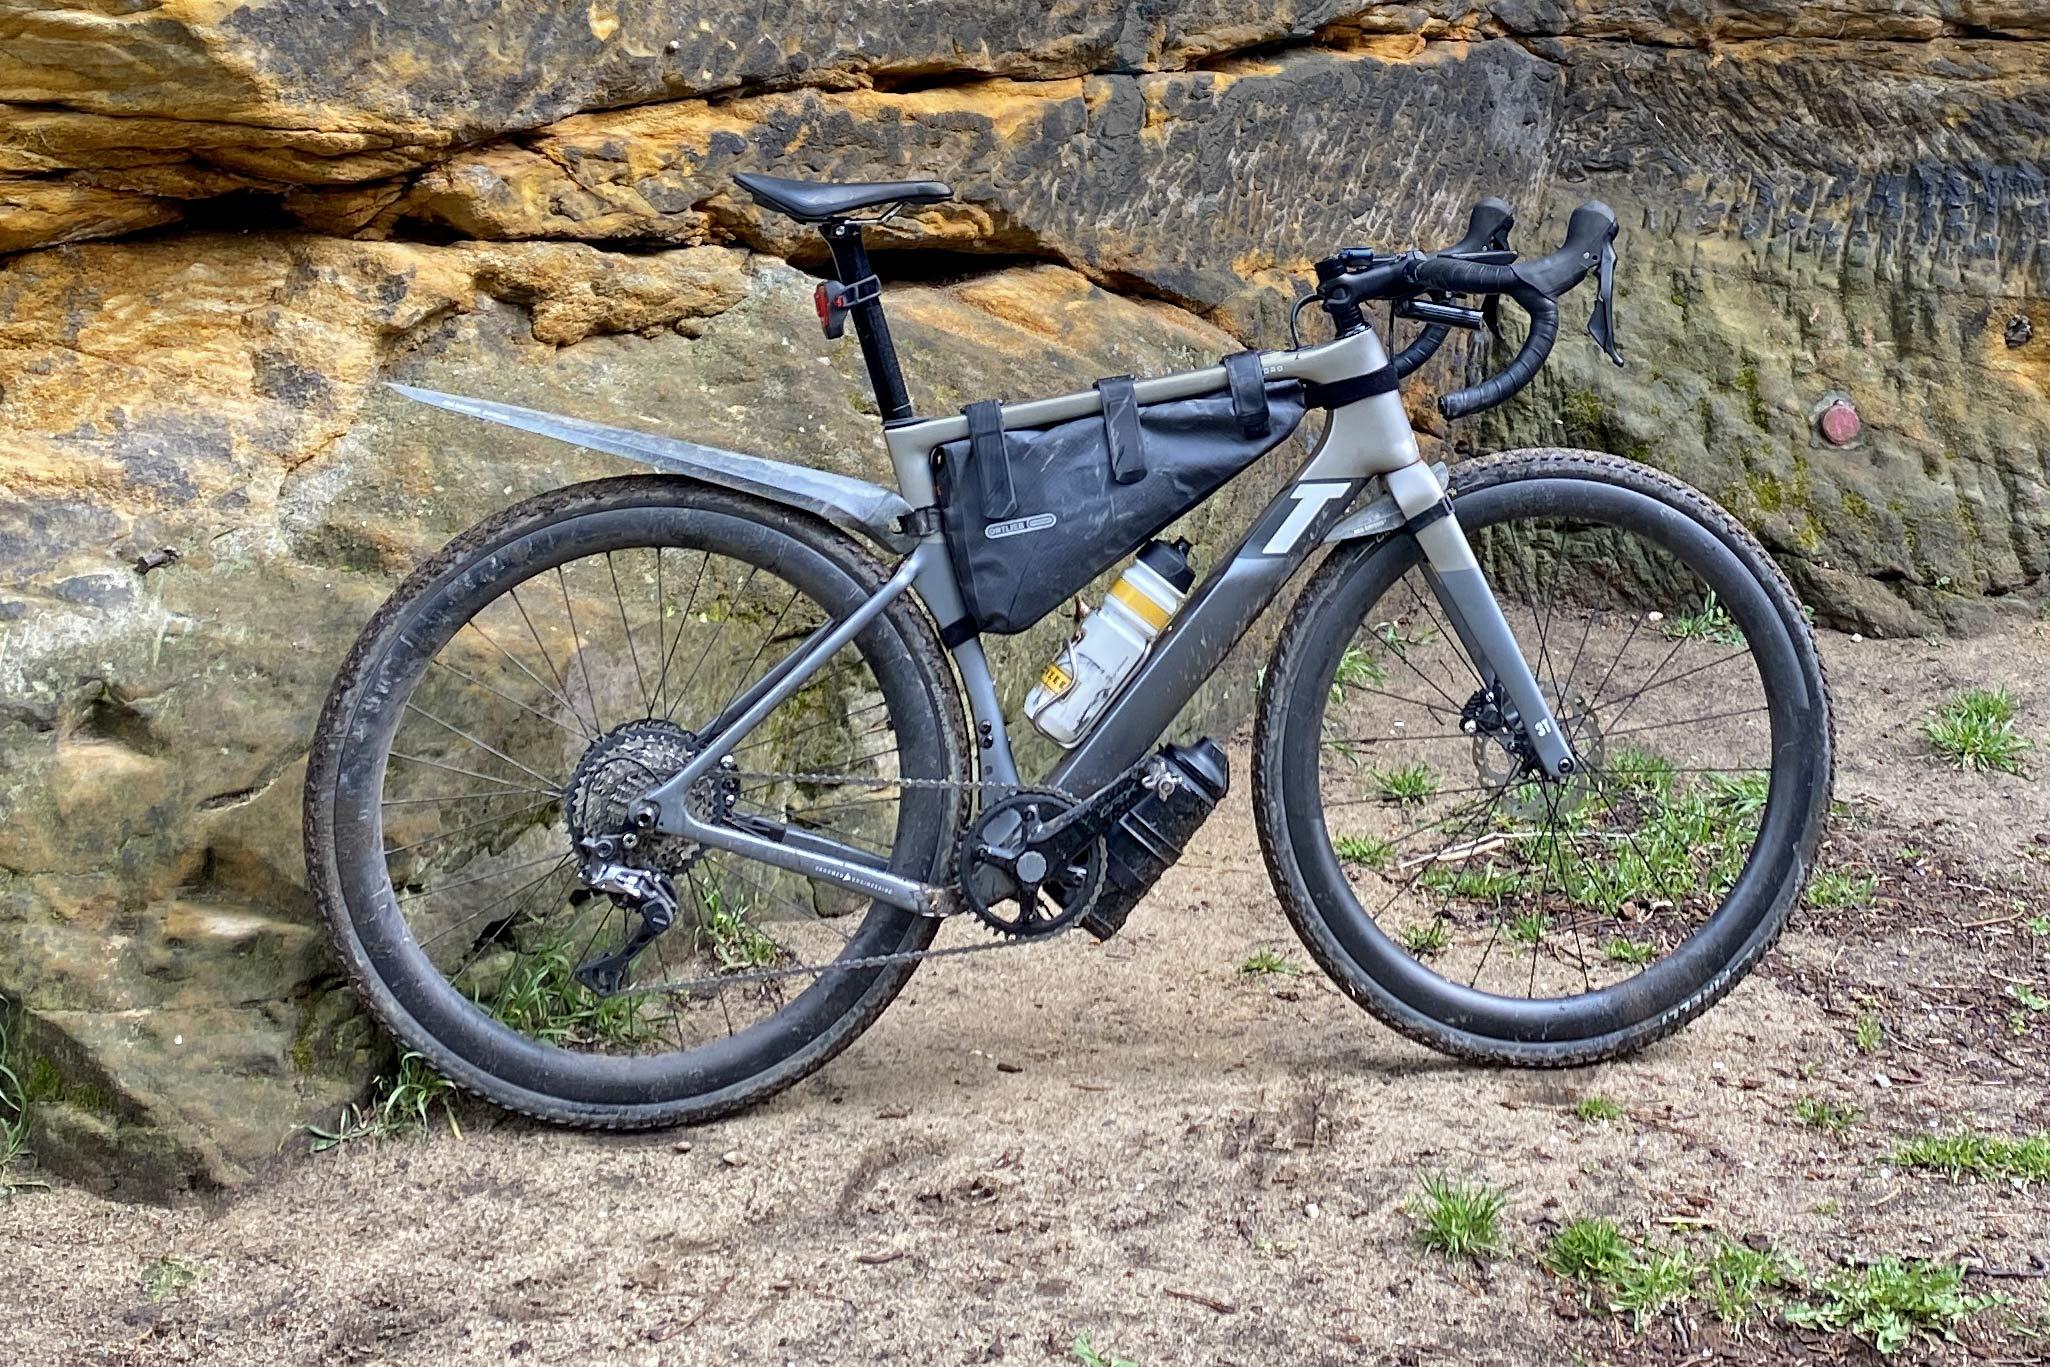 3T Exploro RaceMax Boost gravel e-bike ebikemotion X35review,long distance mode